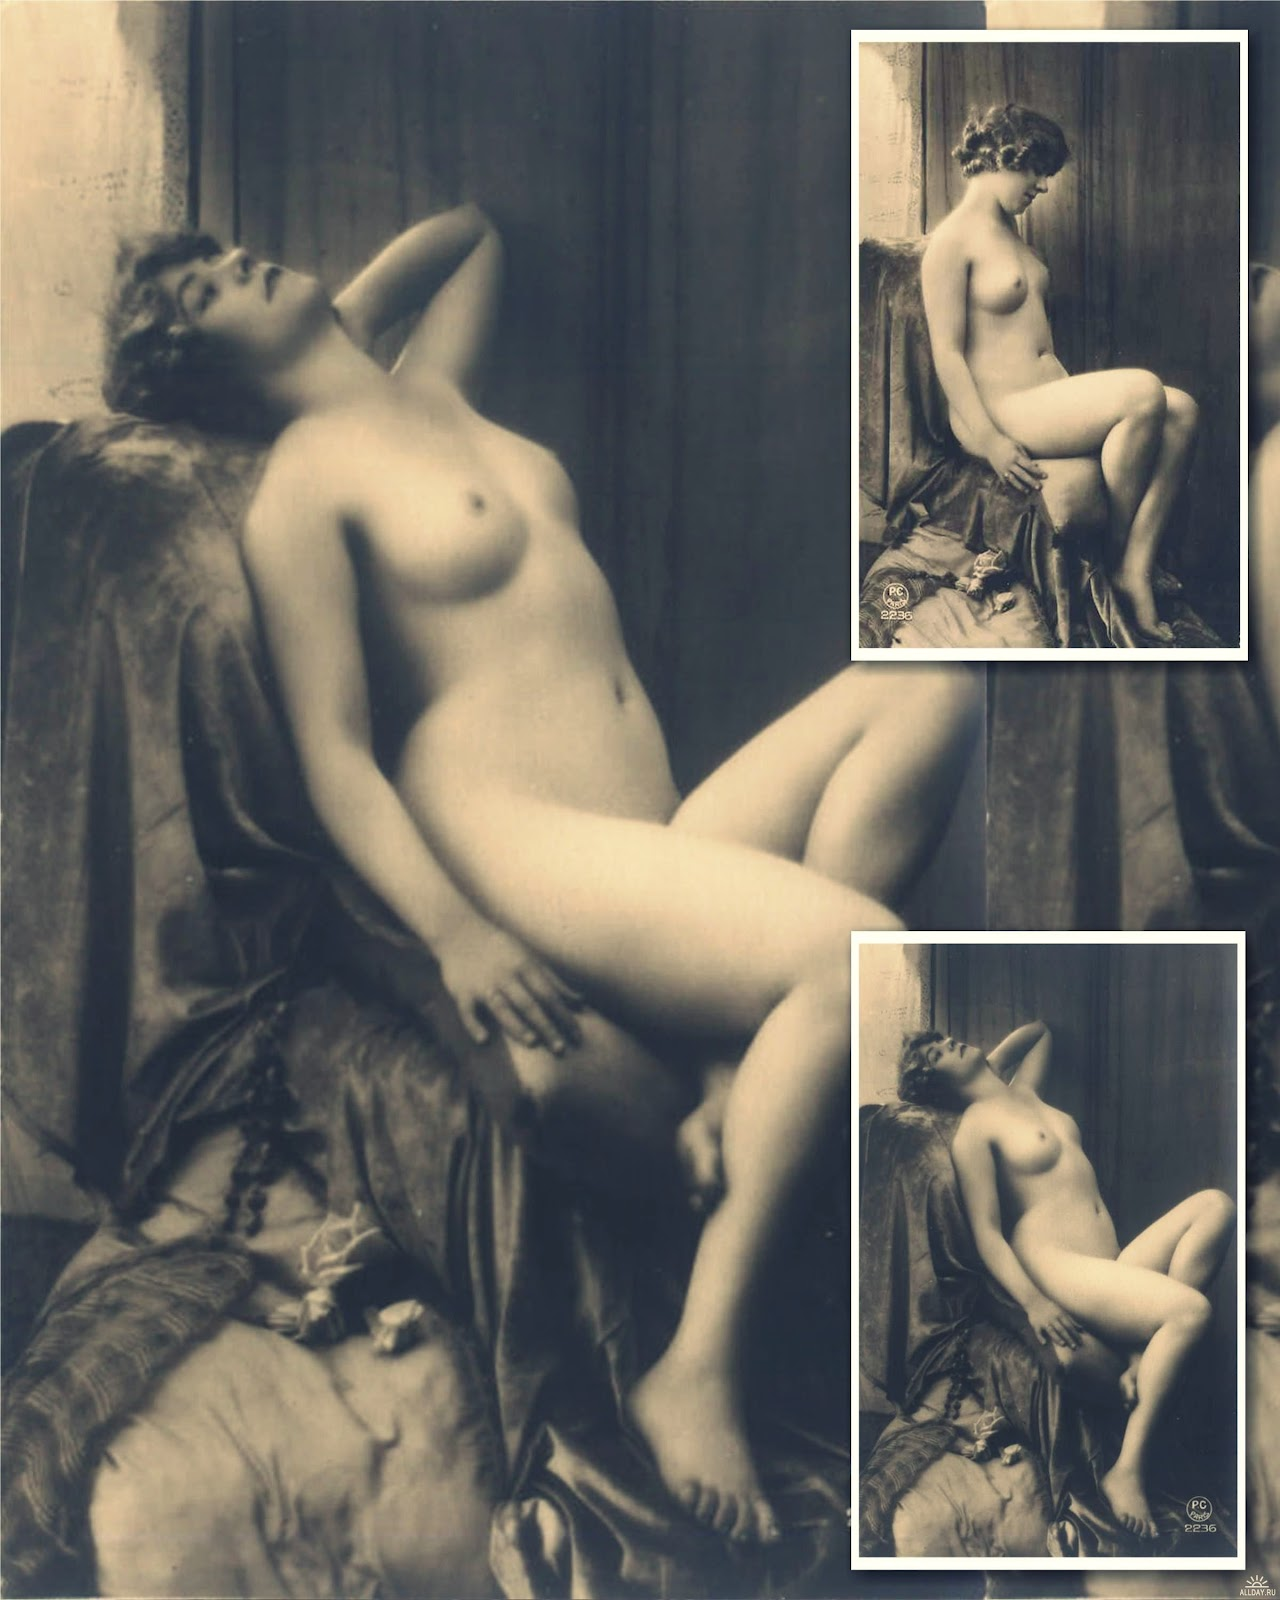 http://1.bp.blogspot.com/-mURjgeasjlQ/T00wB5SSH1I/AAAAAAAAAsM/Pv3GrRTJcgE/s0/1252585260_37.jpg